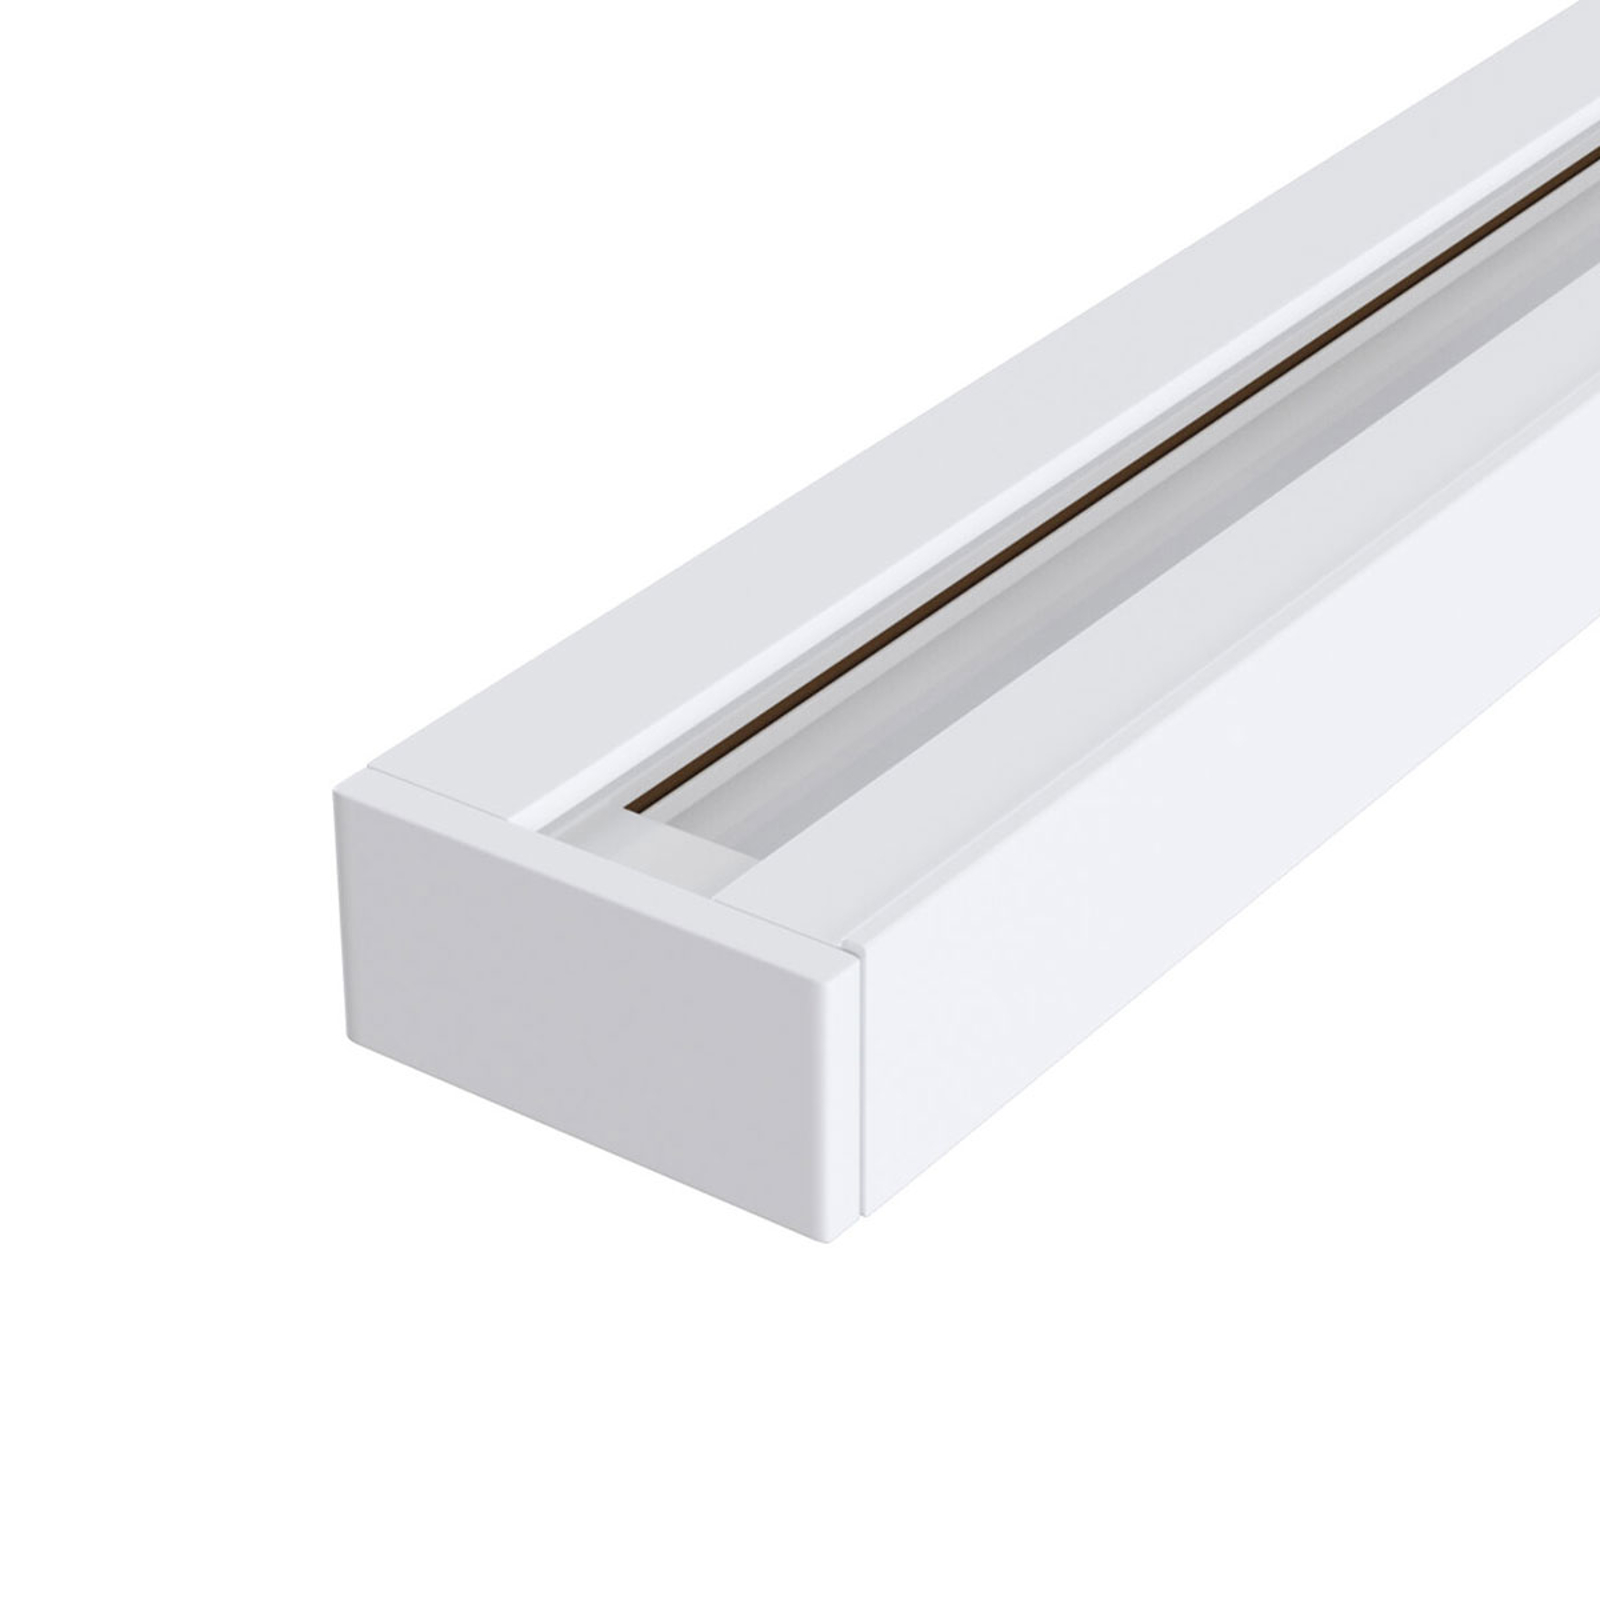 Track 1-fase skinne hvit, 100 cm